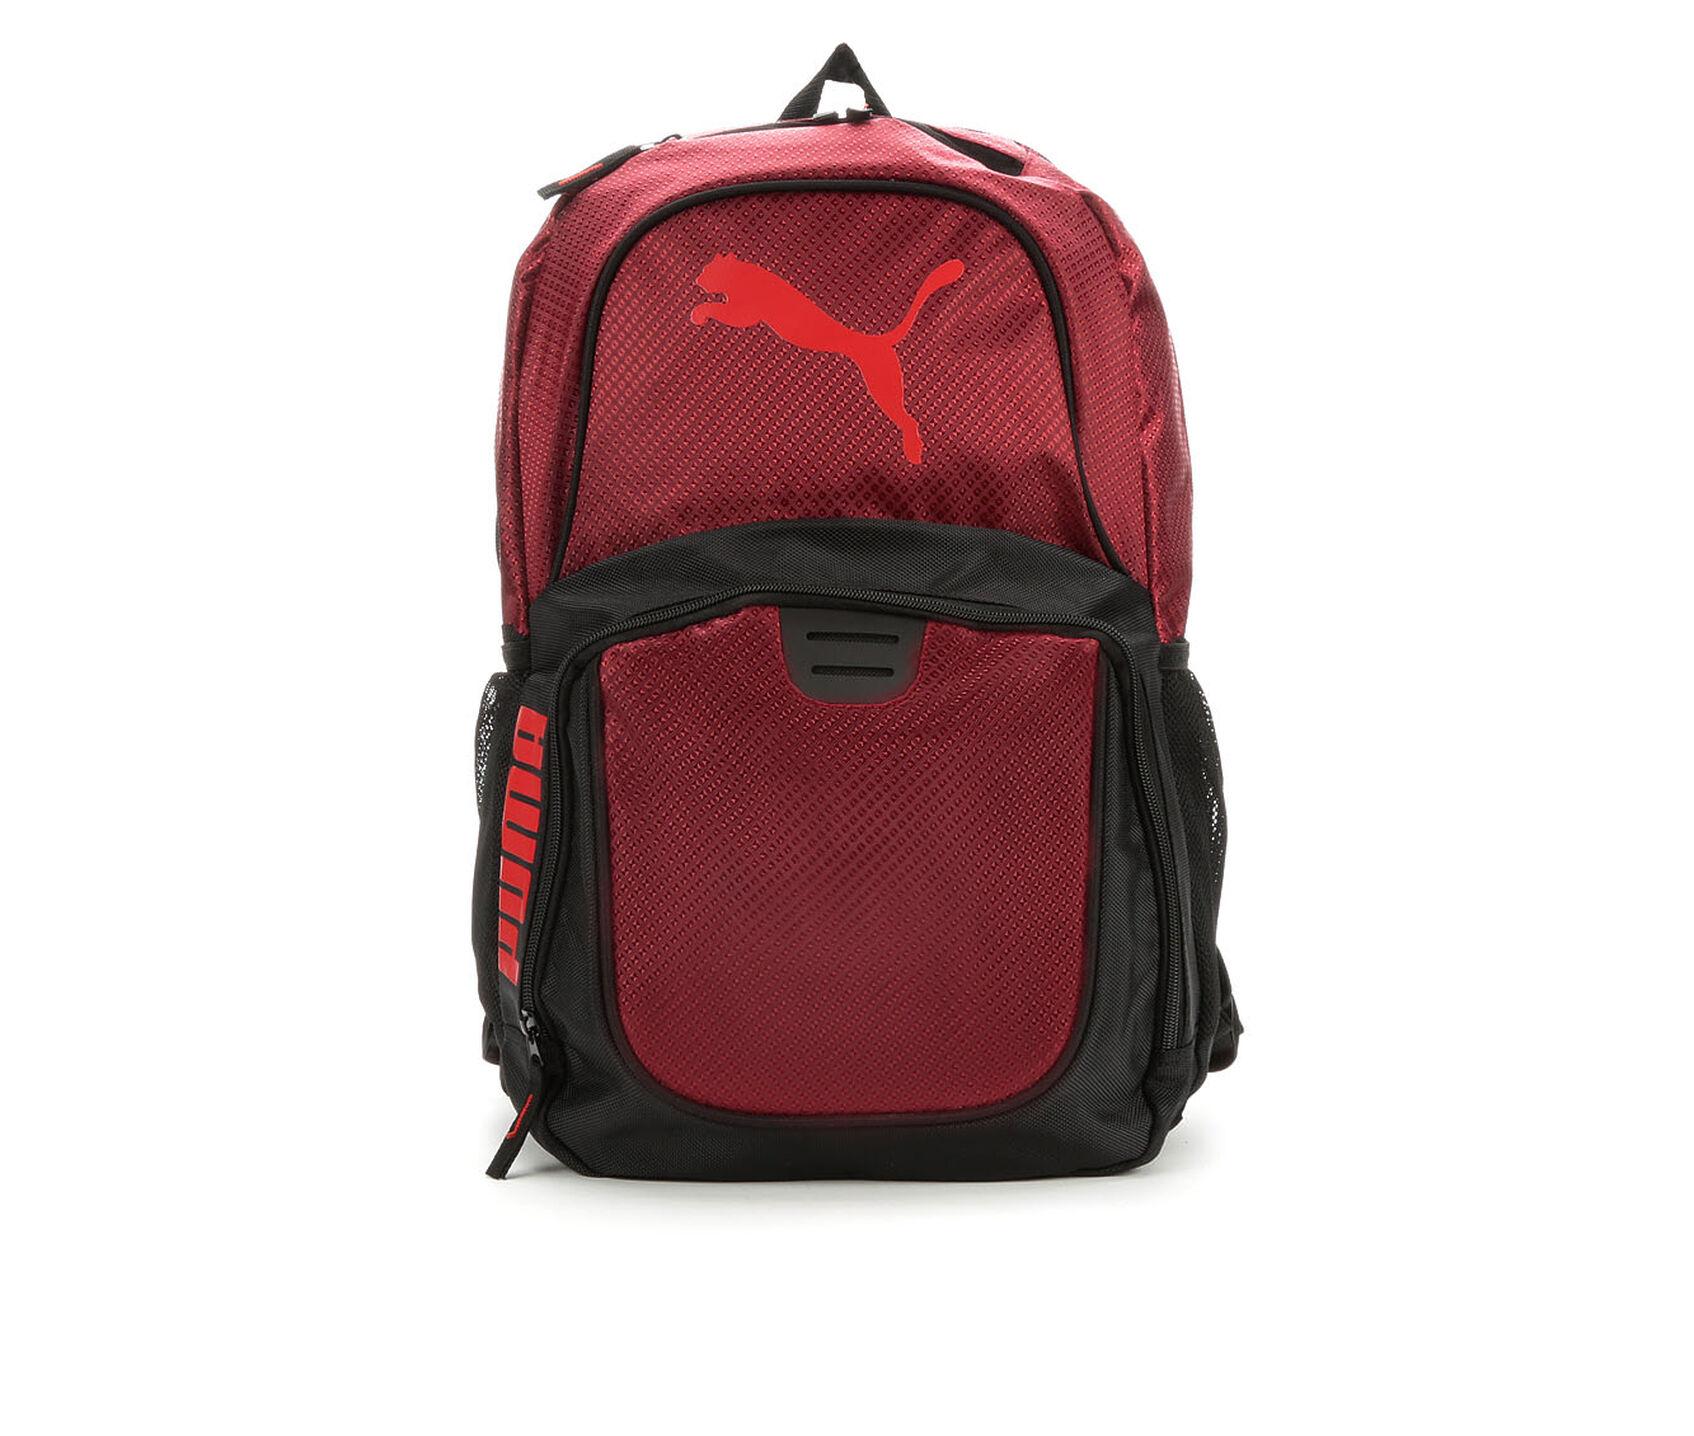 parhaiten myydä Tarjouskoodi 2018 lenkkarit Puma Contender 3.0 Backpack